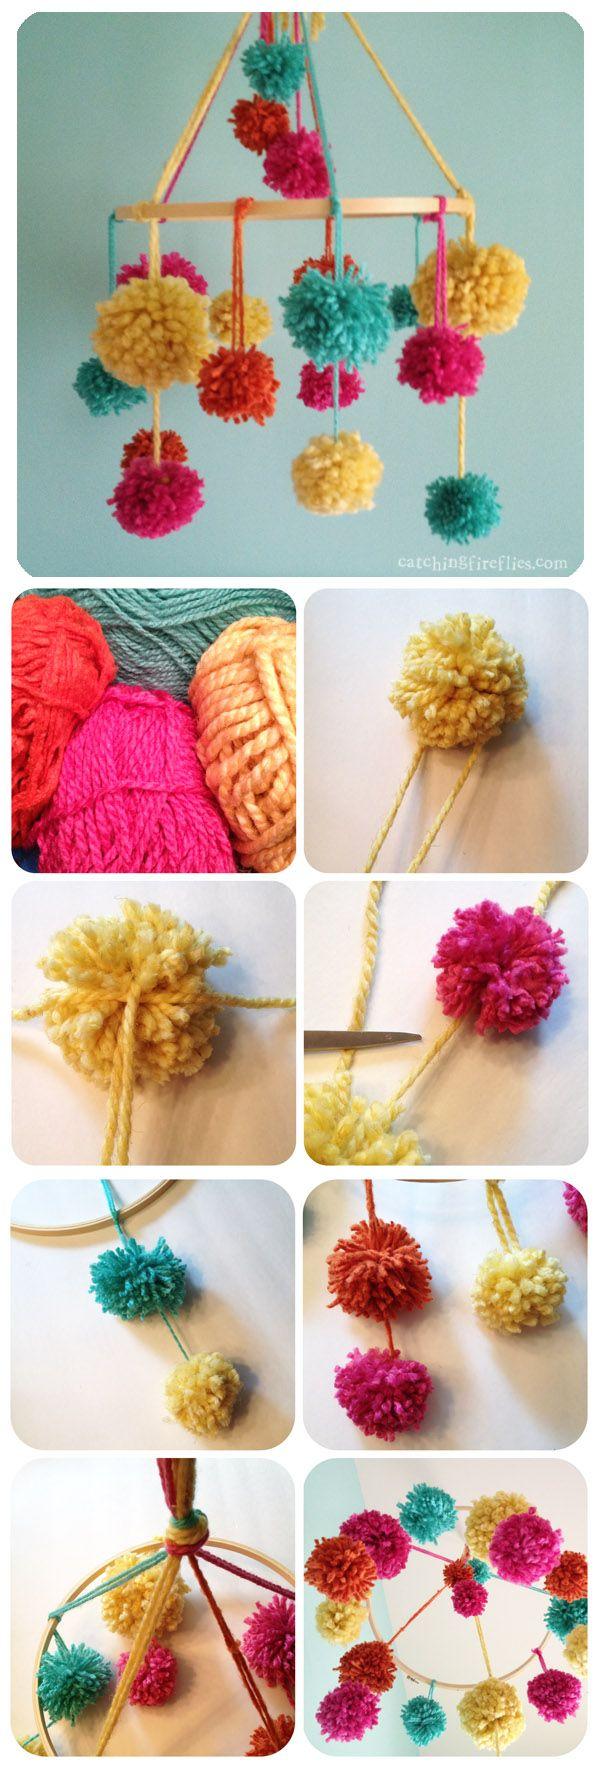 pennants, posies and pom poms - pom pom baby mobile tutorial, cute nursery ideas, diy mobile for girls room